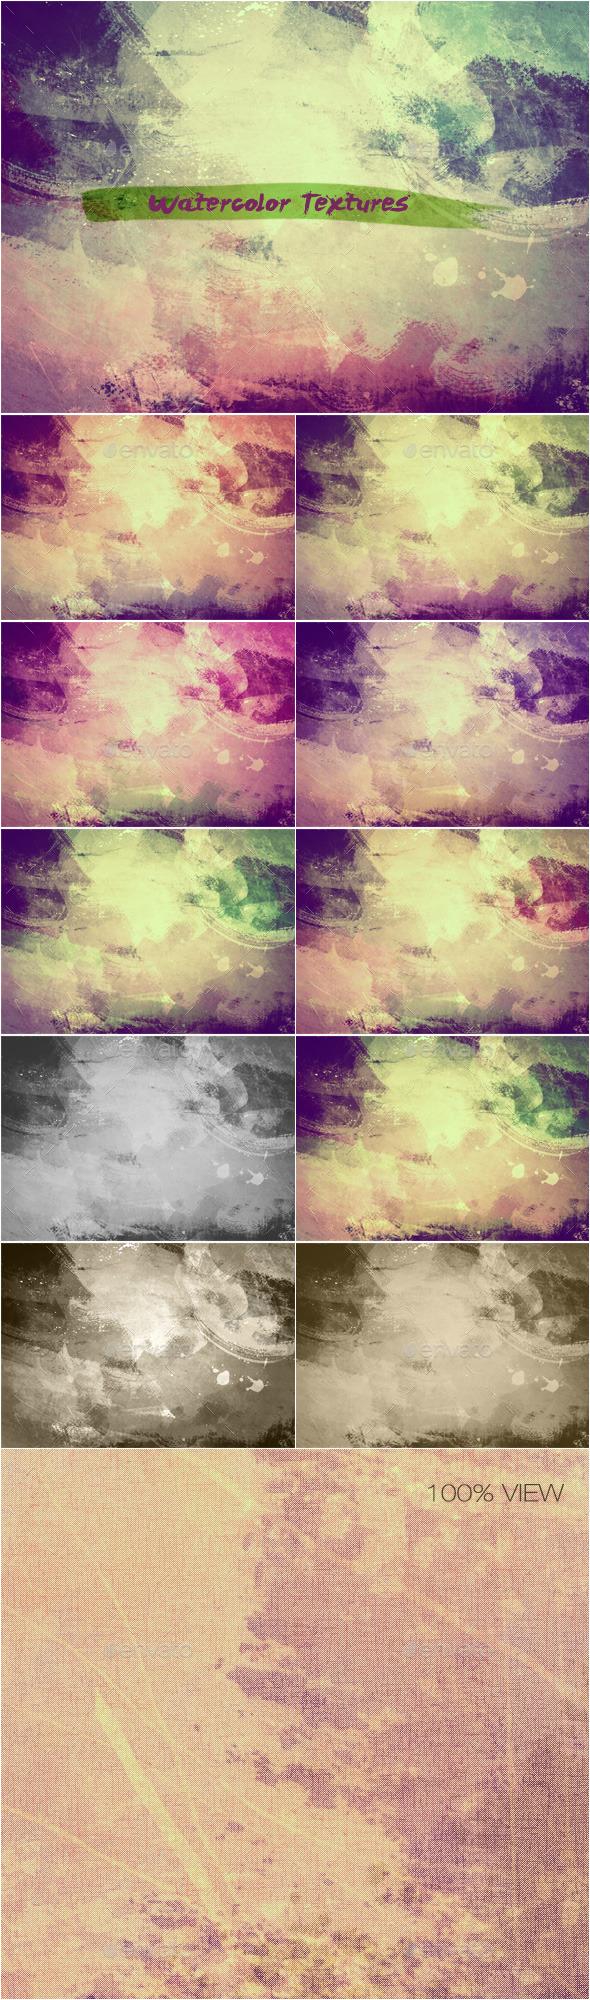 GraphicRiver Watercolor Textures Set 6 11447216